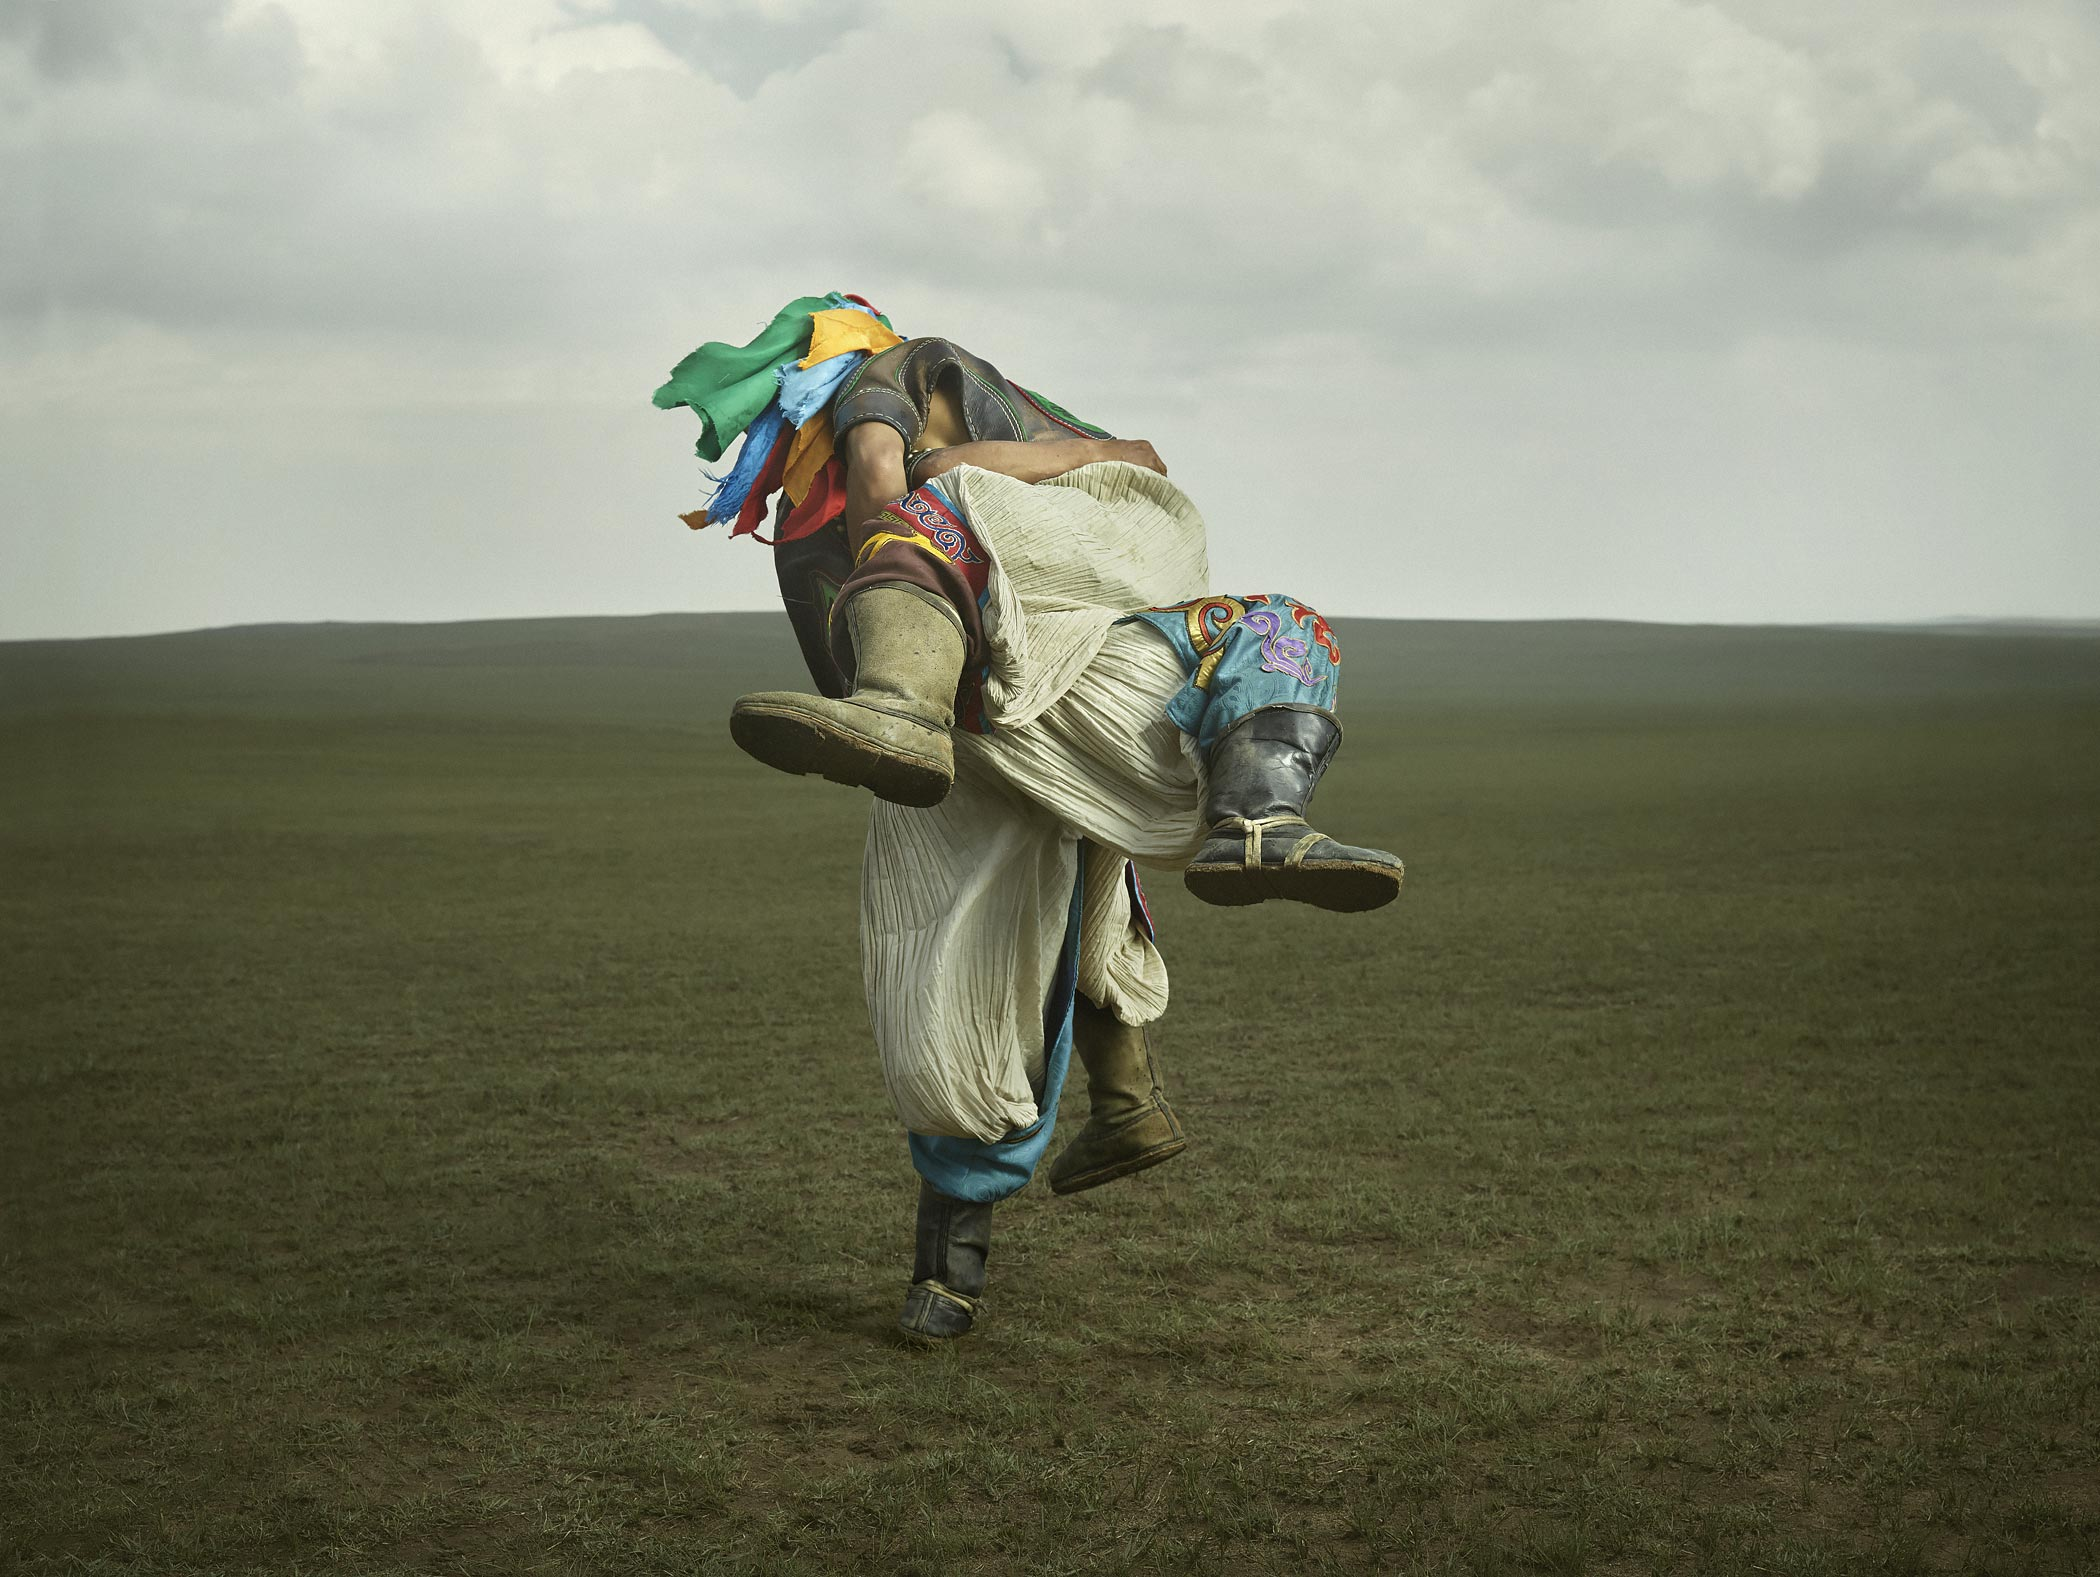 ken-hermann-bokh-2016-photography-of-china-1.jpg